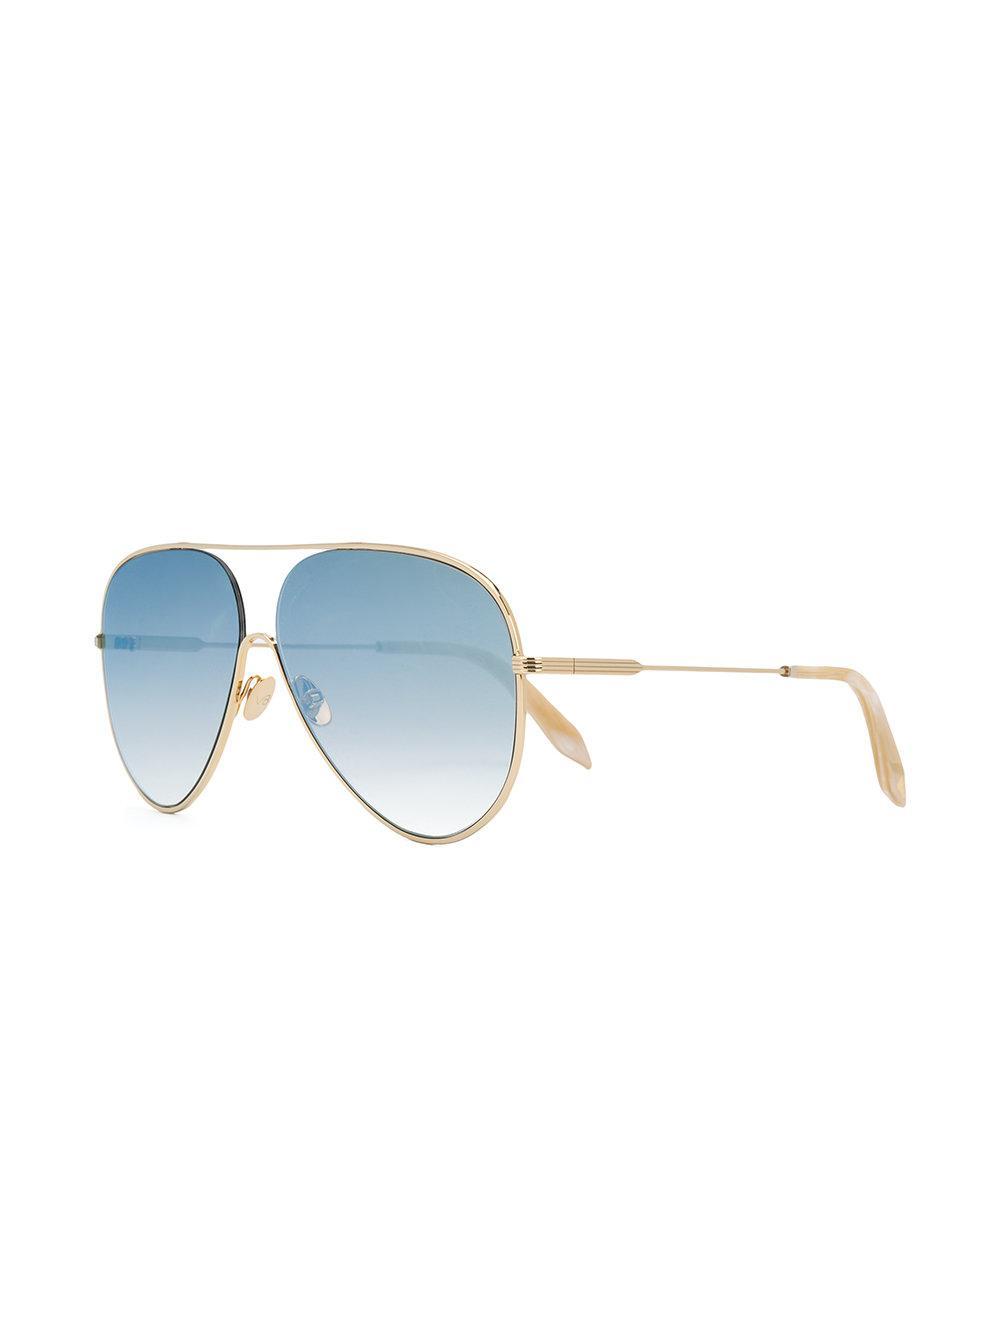 Victoria, Victoria Beckham Aviator Sunglasses in Blue